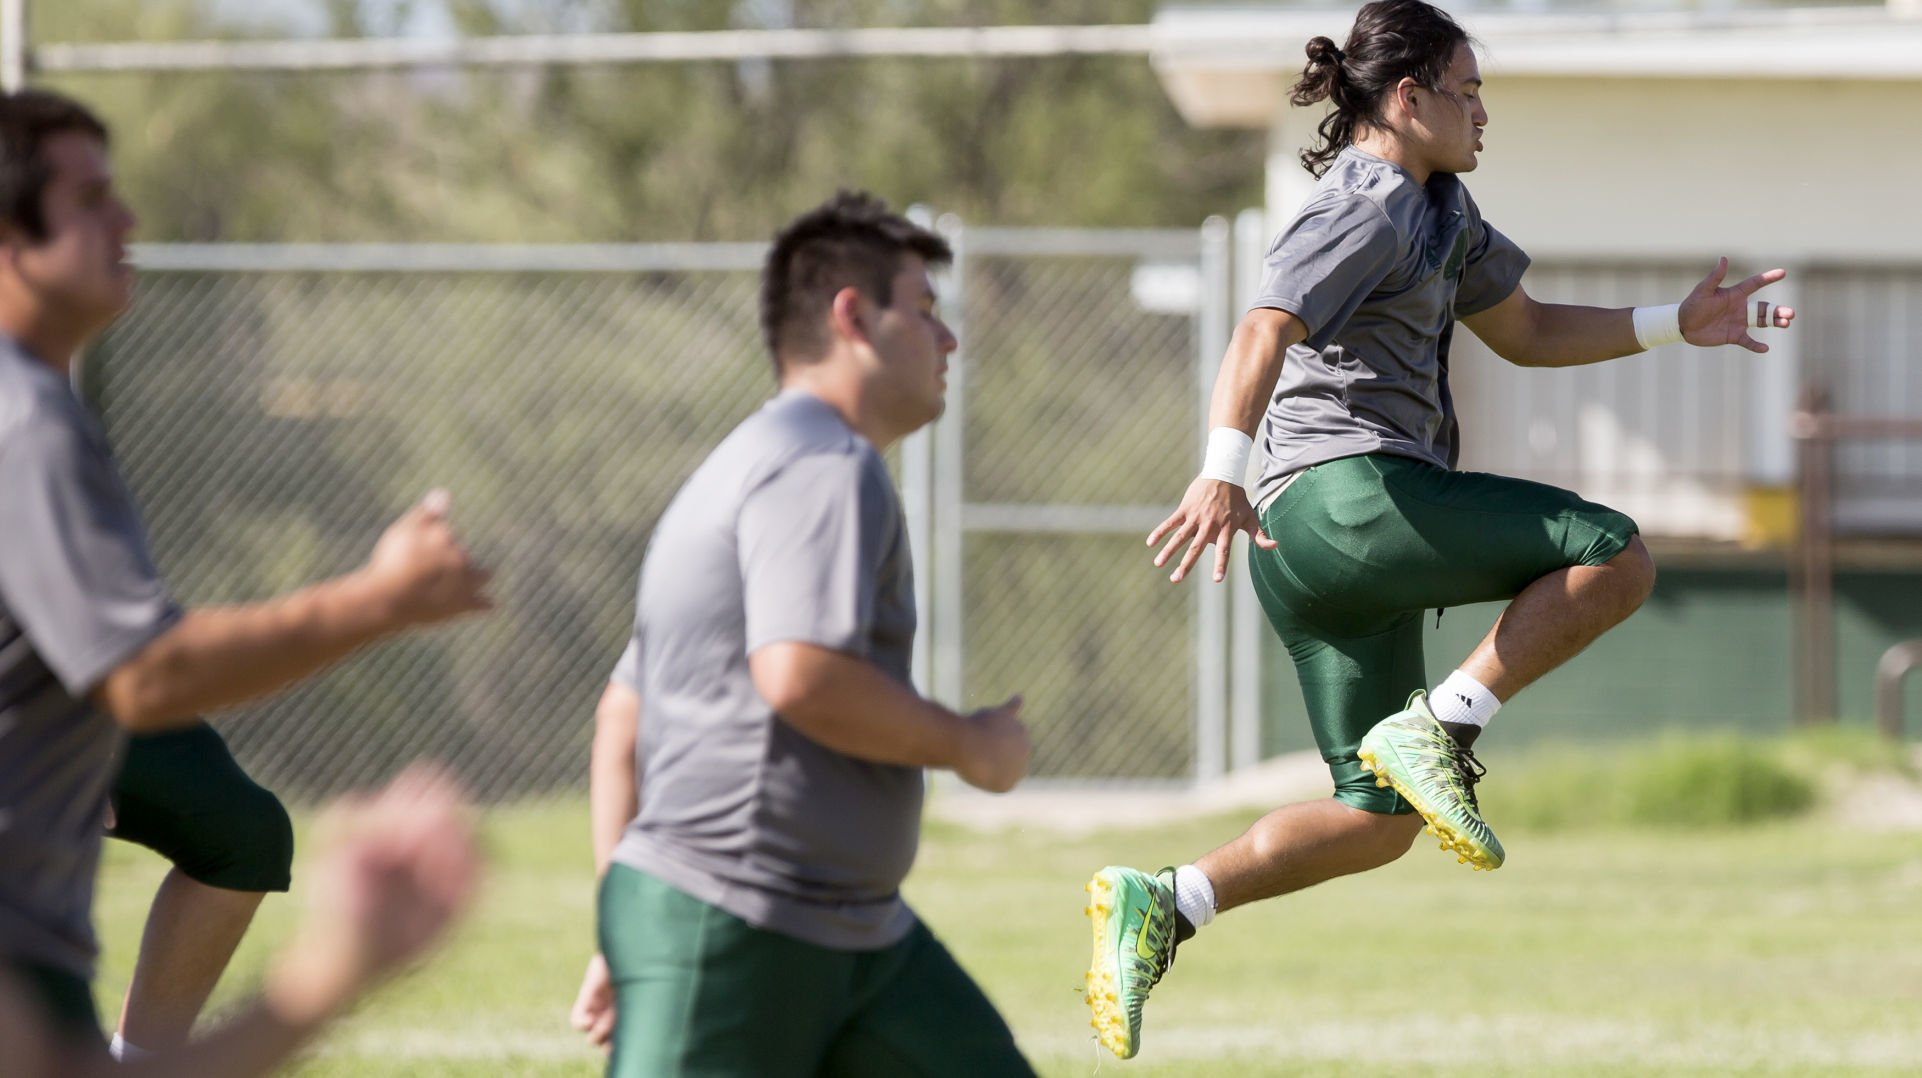 Canyon del Oro's versatile Gavin Davis ready to face former teammates, coaches from Pusch Ridge Christian